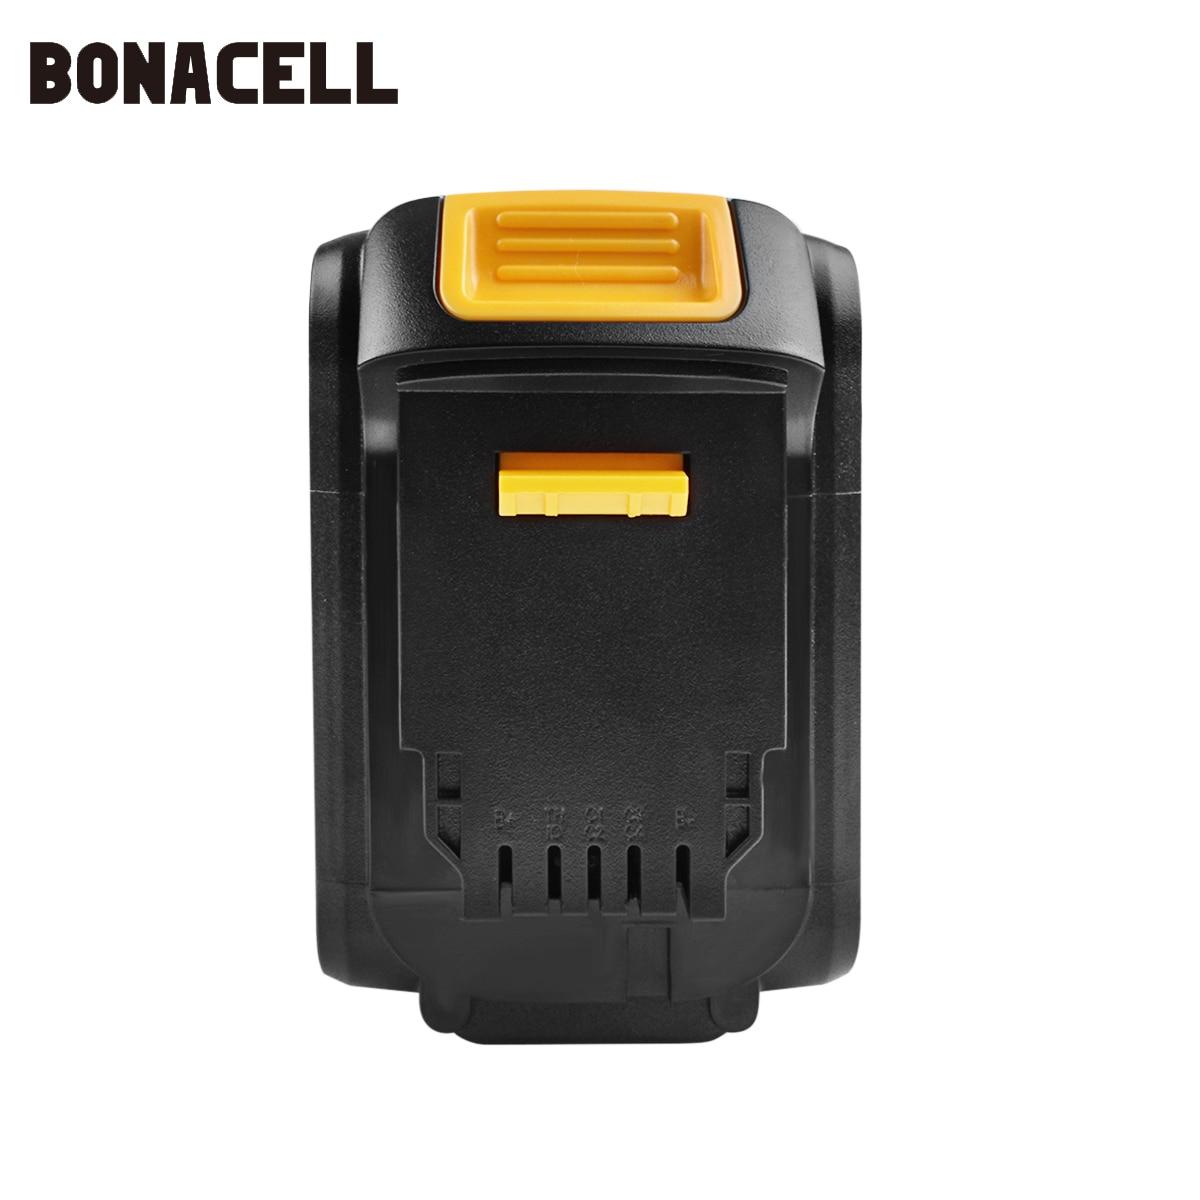 Image 4 - Bonacell Battery for Dewalt 4000mAh Replacement Battery for DCB200 DCB181 DCB182 DCB204 2  DCB201 DCB201 2 L10-in Replacement Batteries from Consumer Electronics